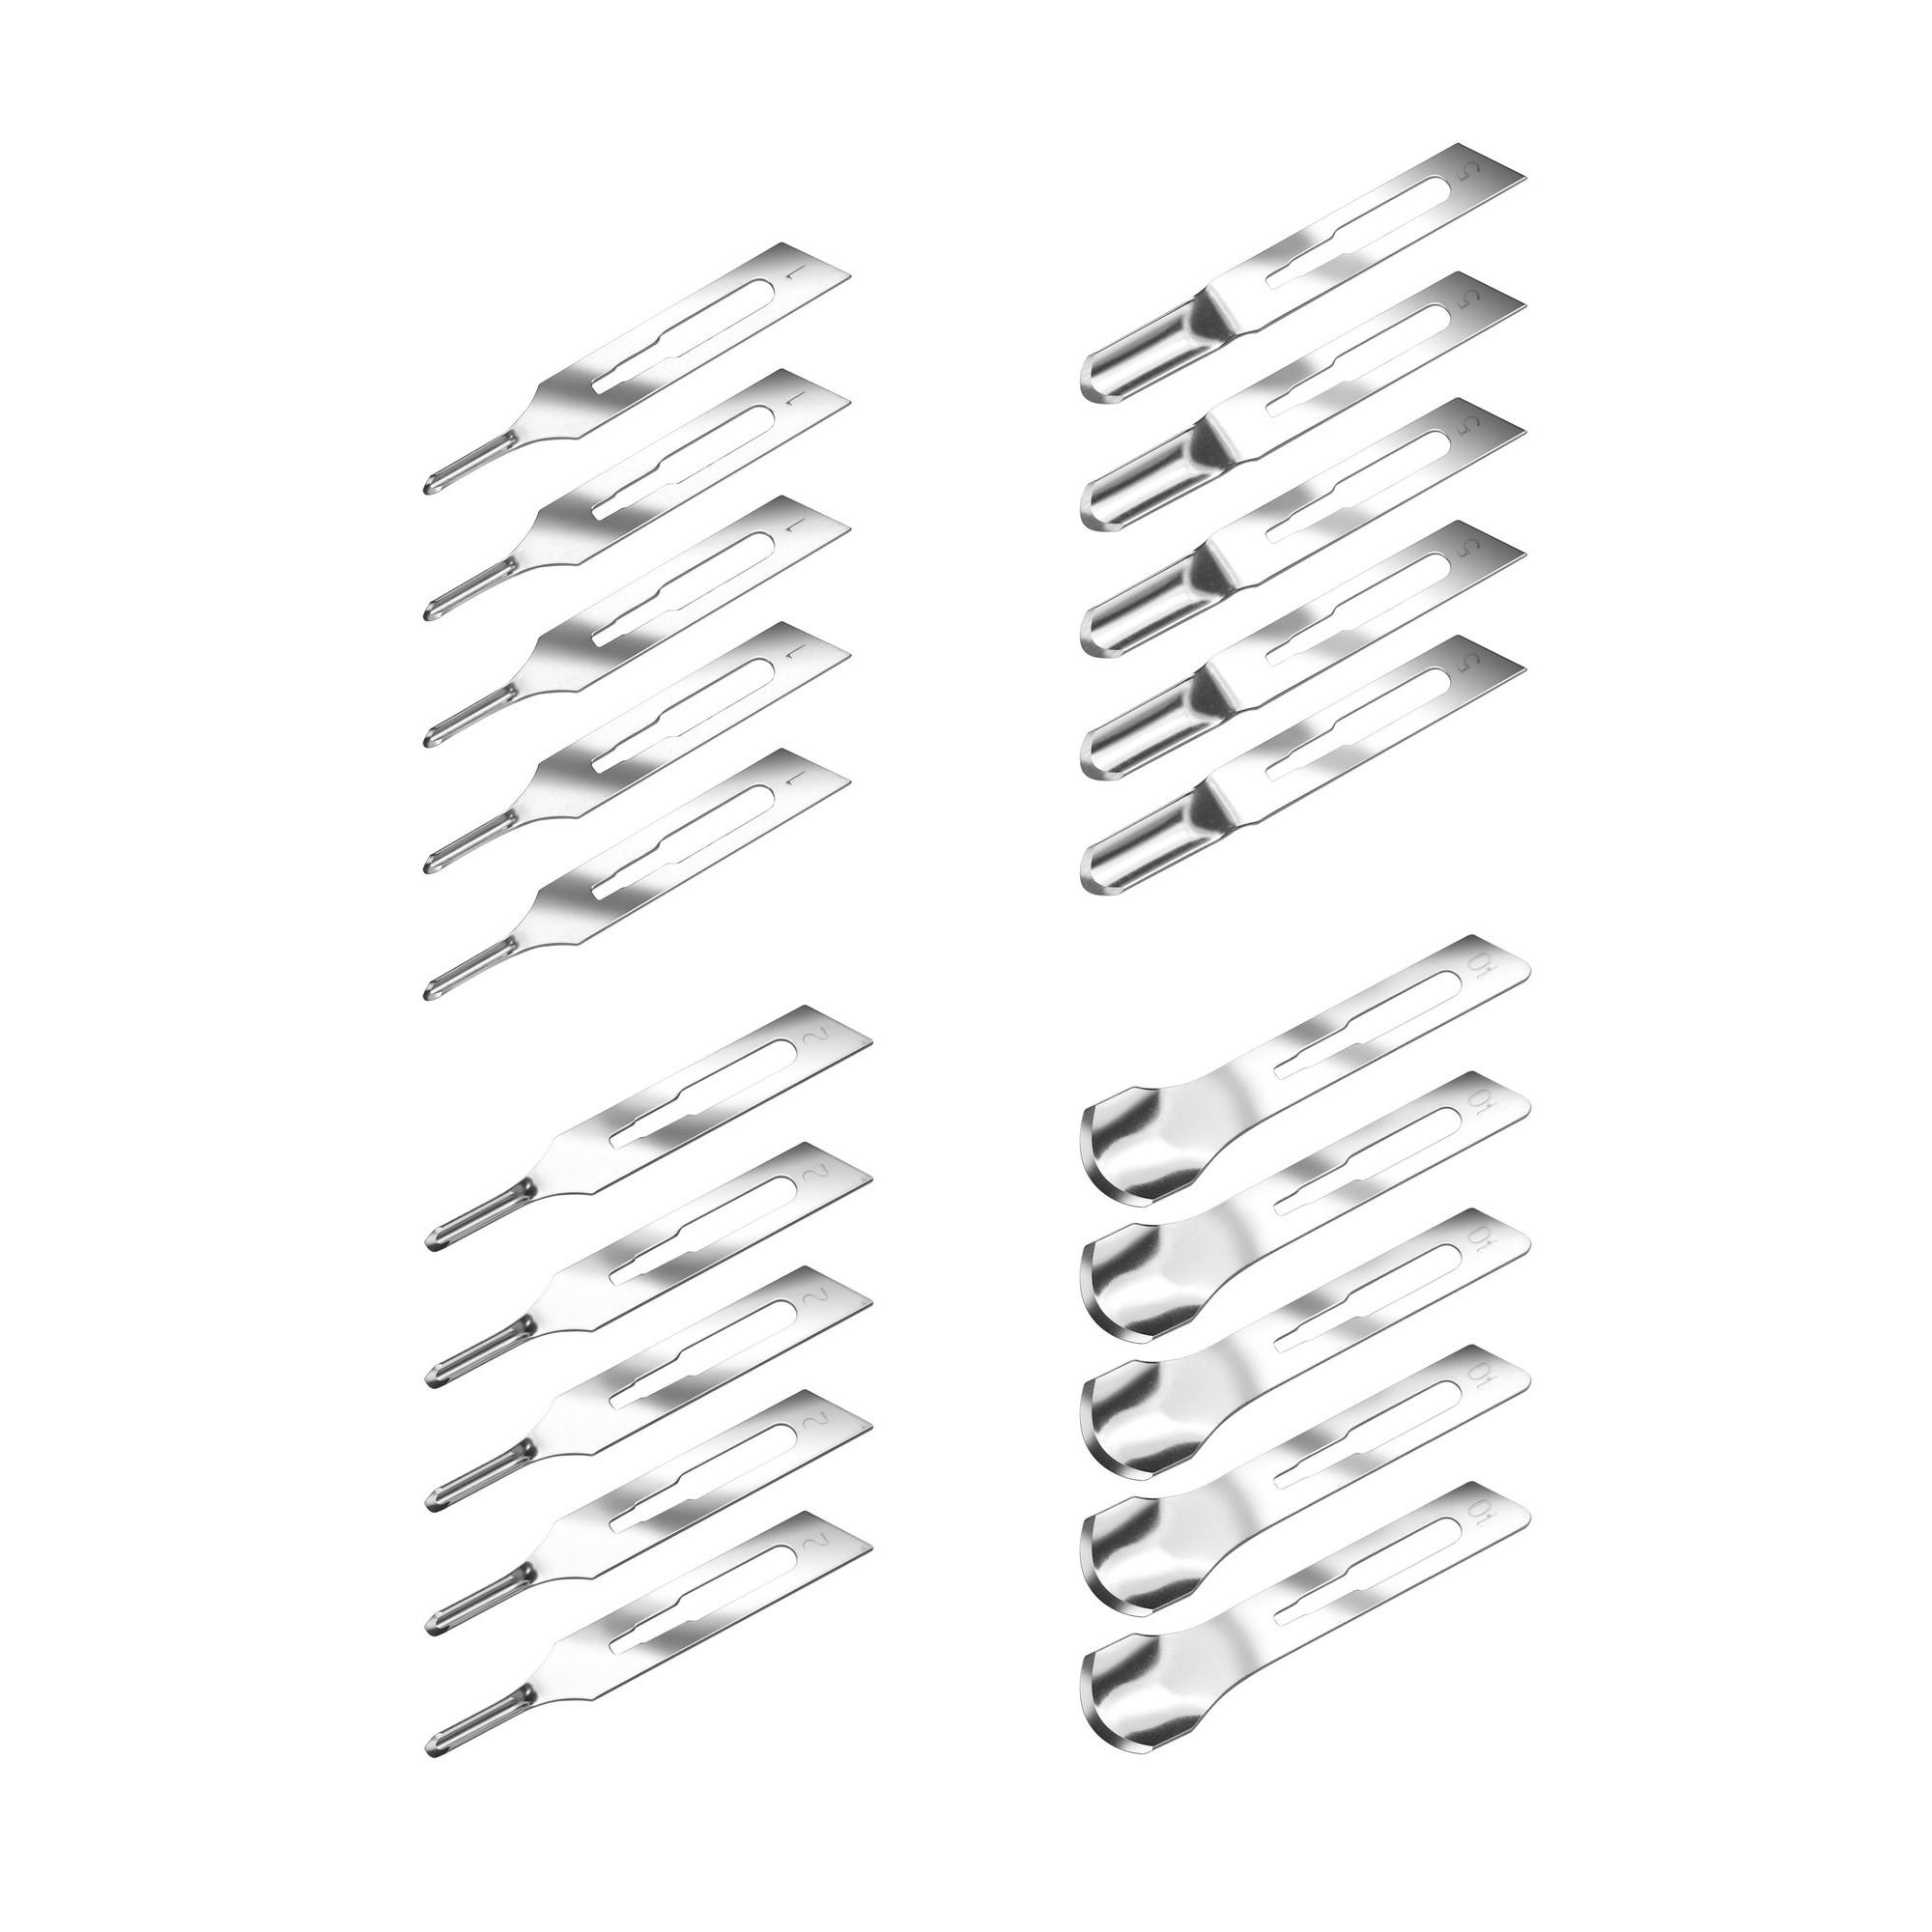 Pack - Lames de burin - 5 x 1V, 2V, 3V et 10 - Ruck